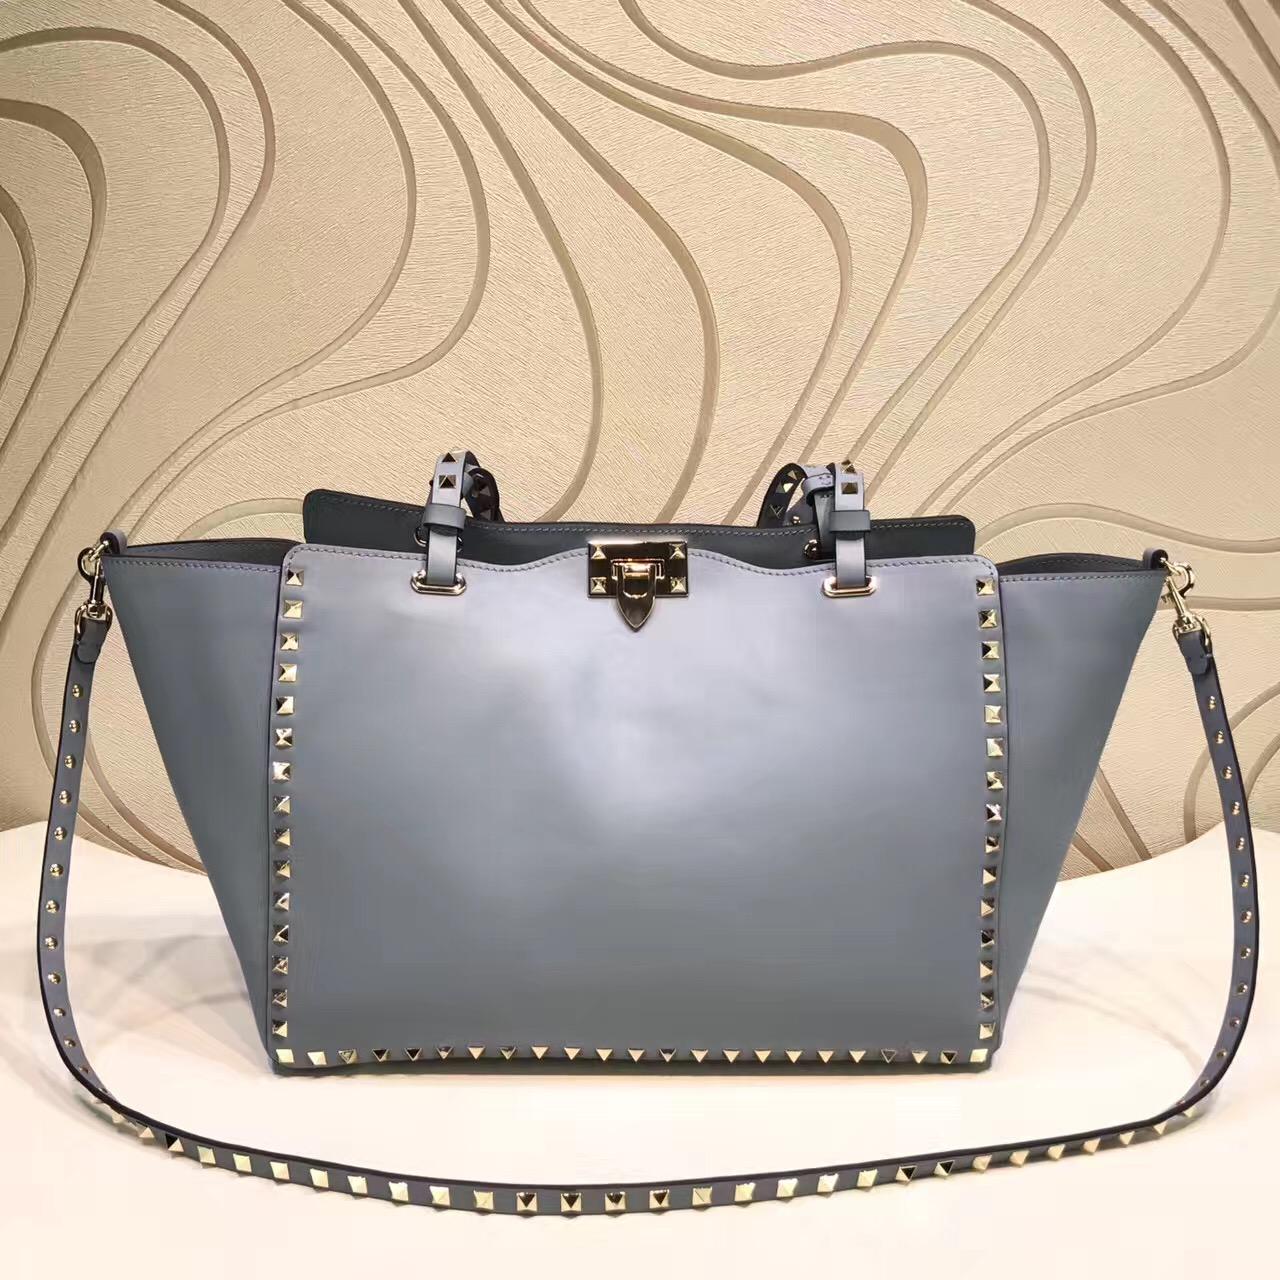 4f9e9ddd91 The Best Valentino Rockstud Replica Handbags Online Store